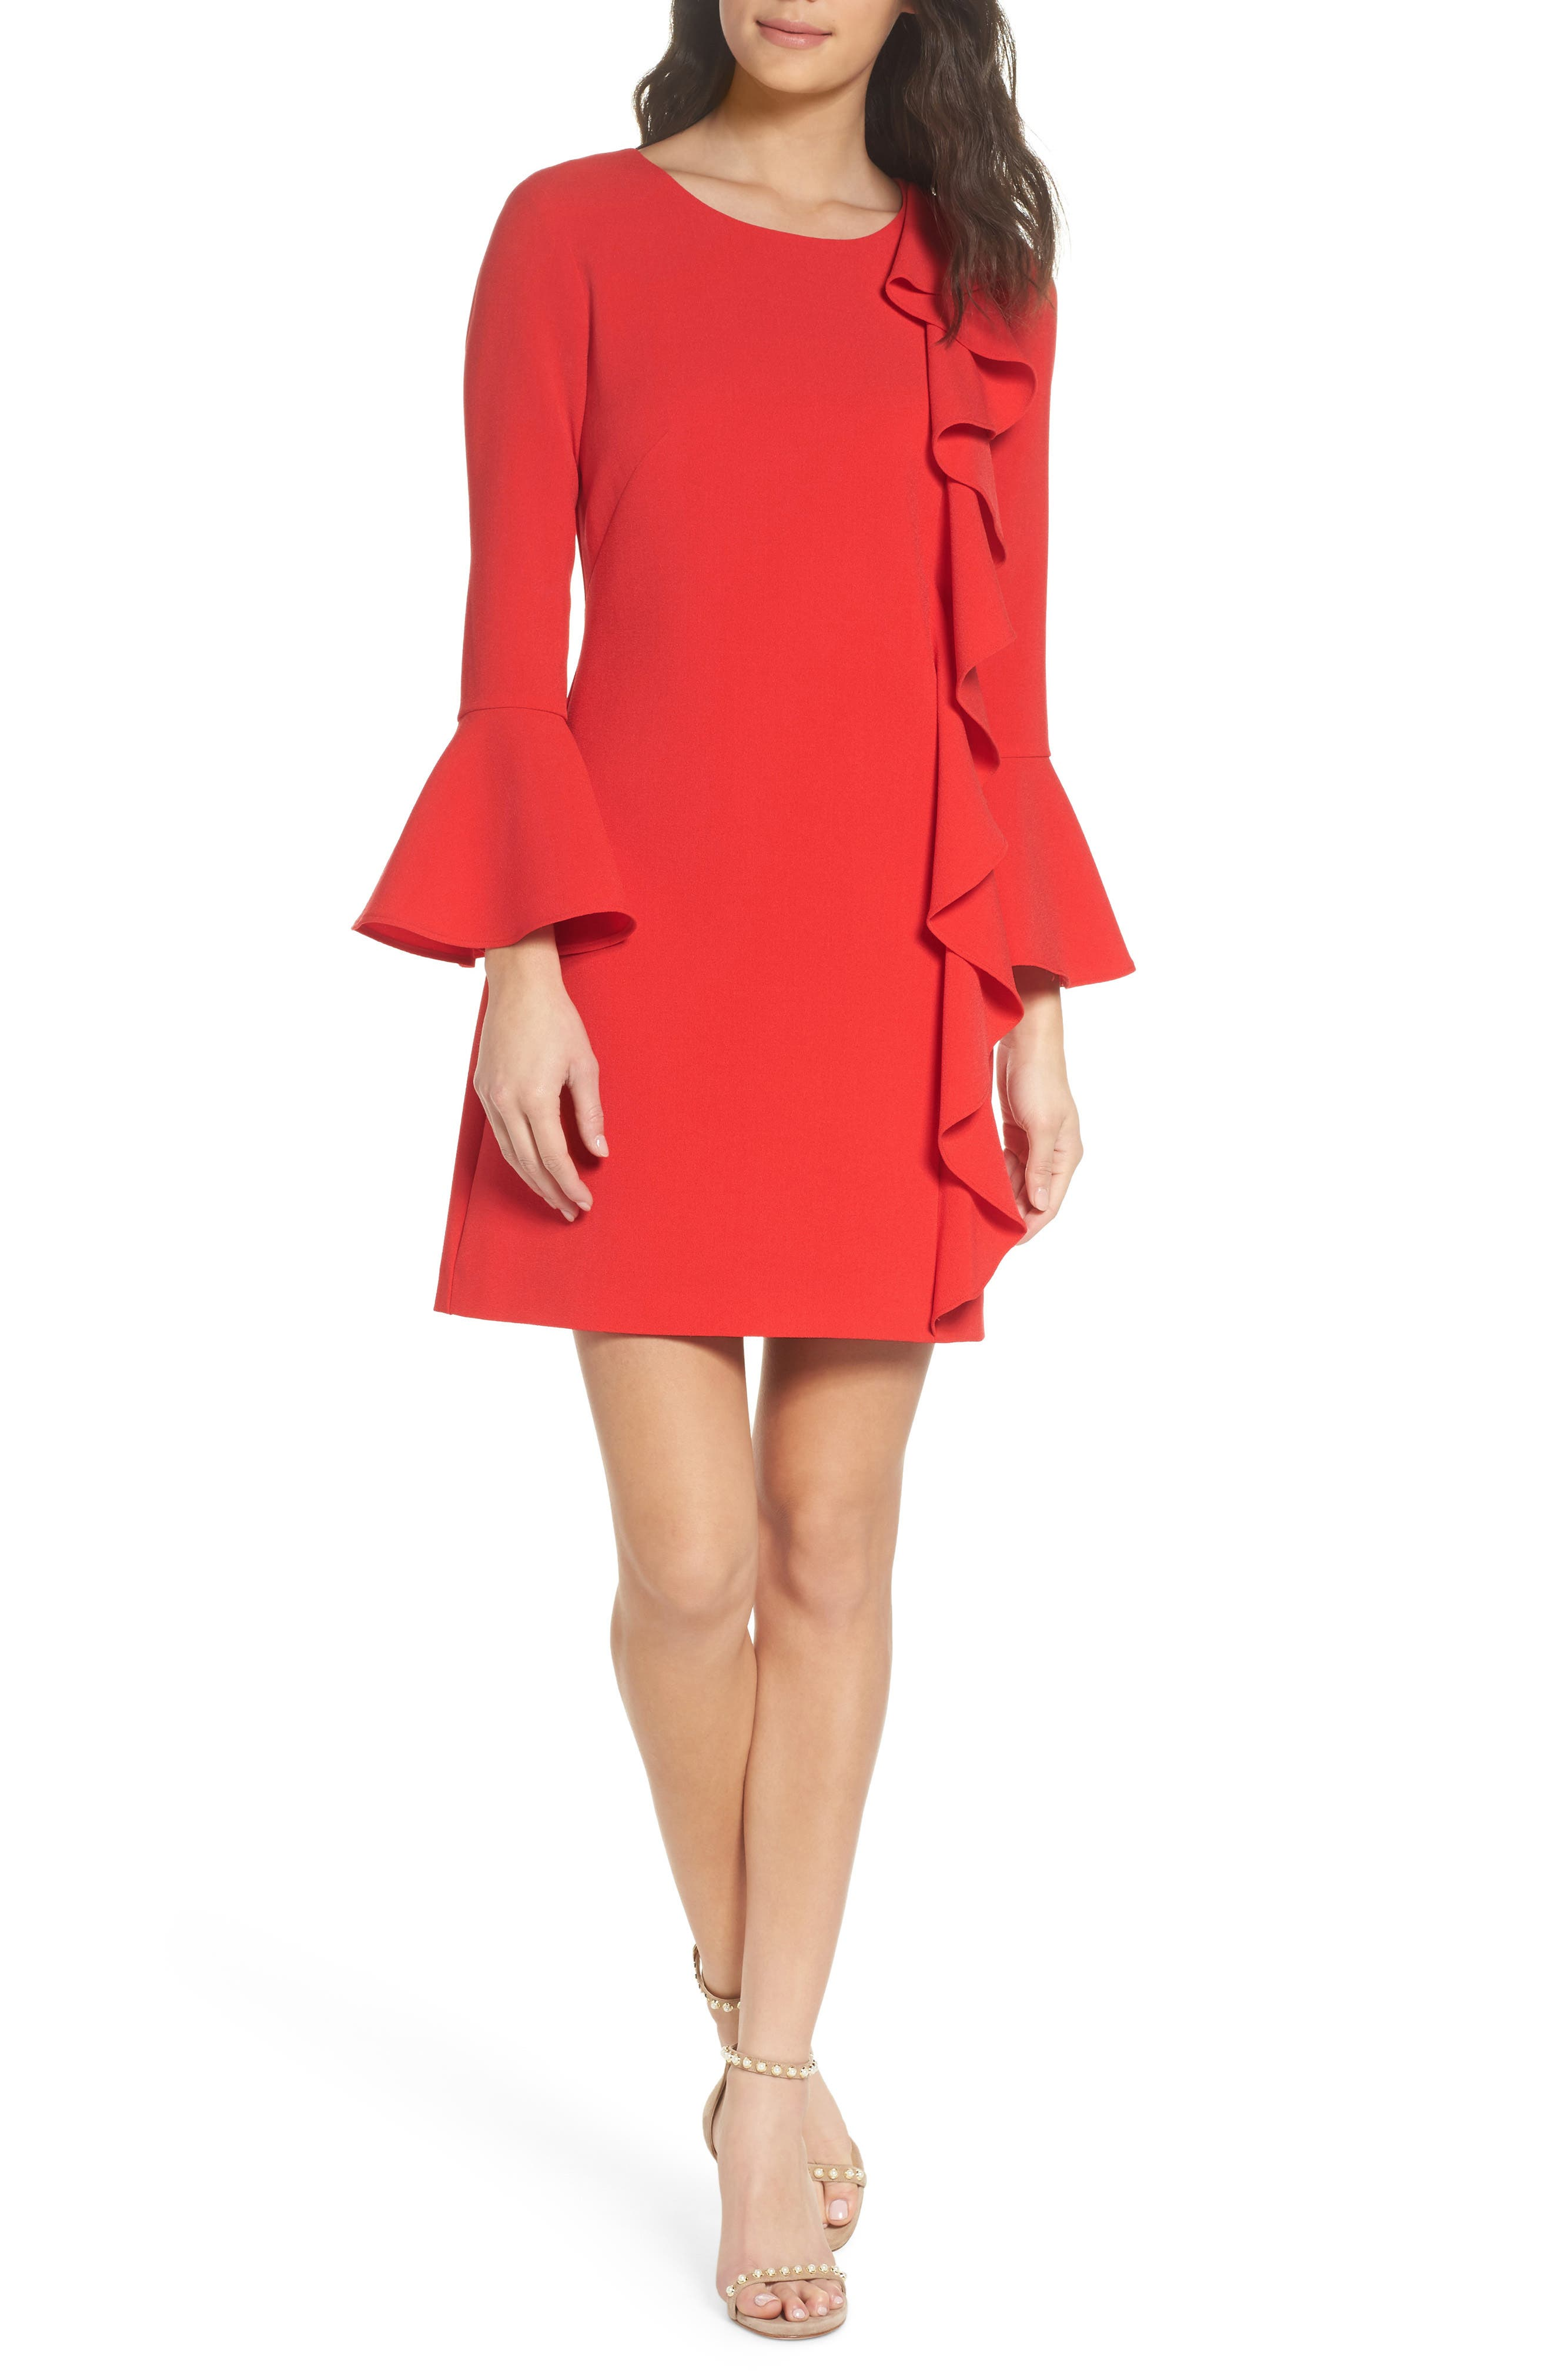 Main Image - Chelsea28 Ruffle Shift Dress